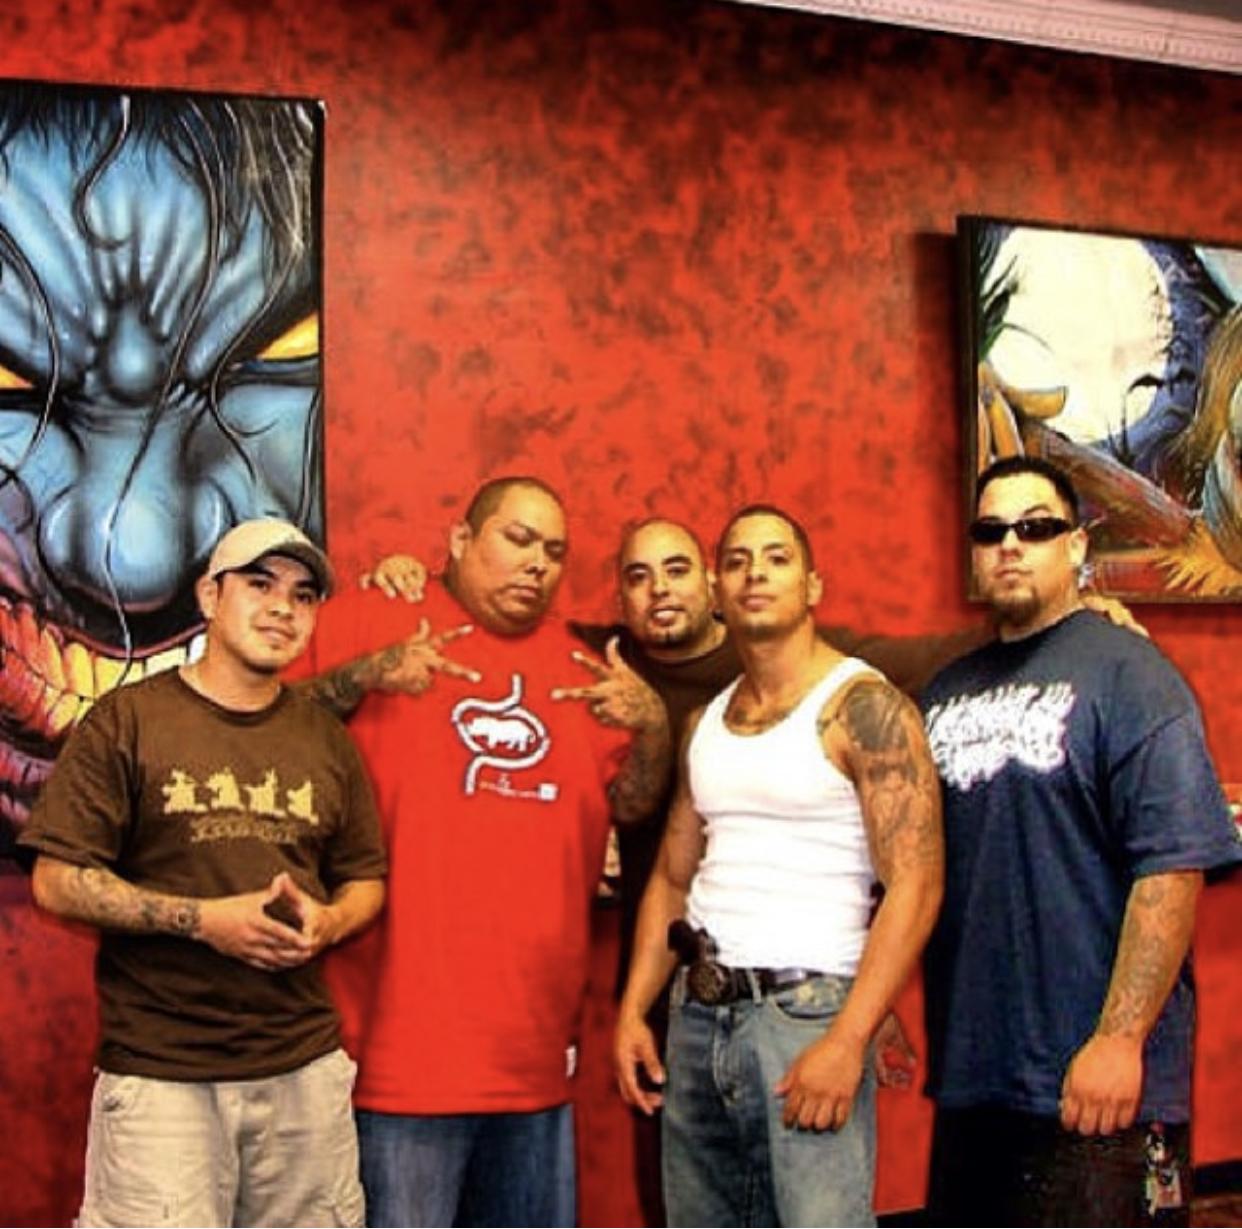 Alan Padilla, Boog RIP, myself, my bro Angel, and Big Gus